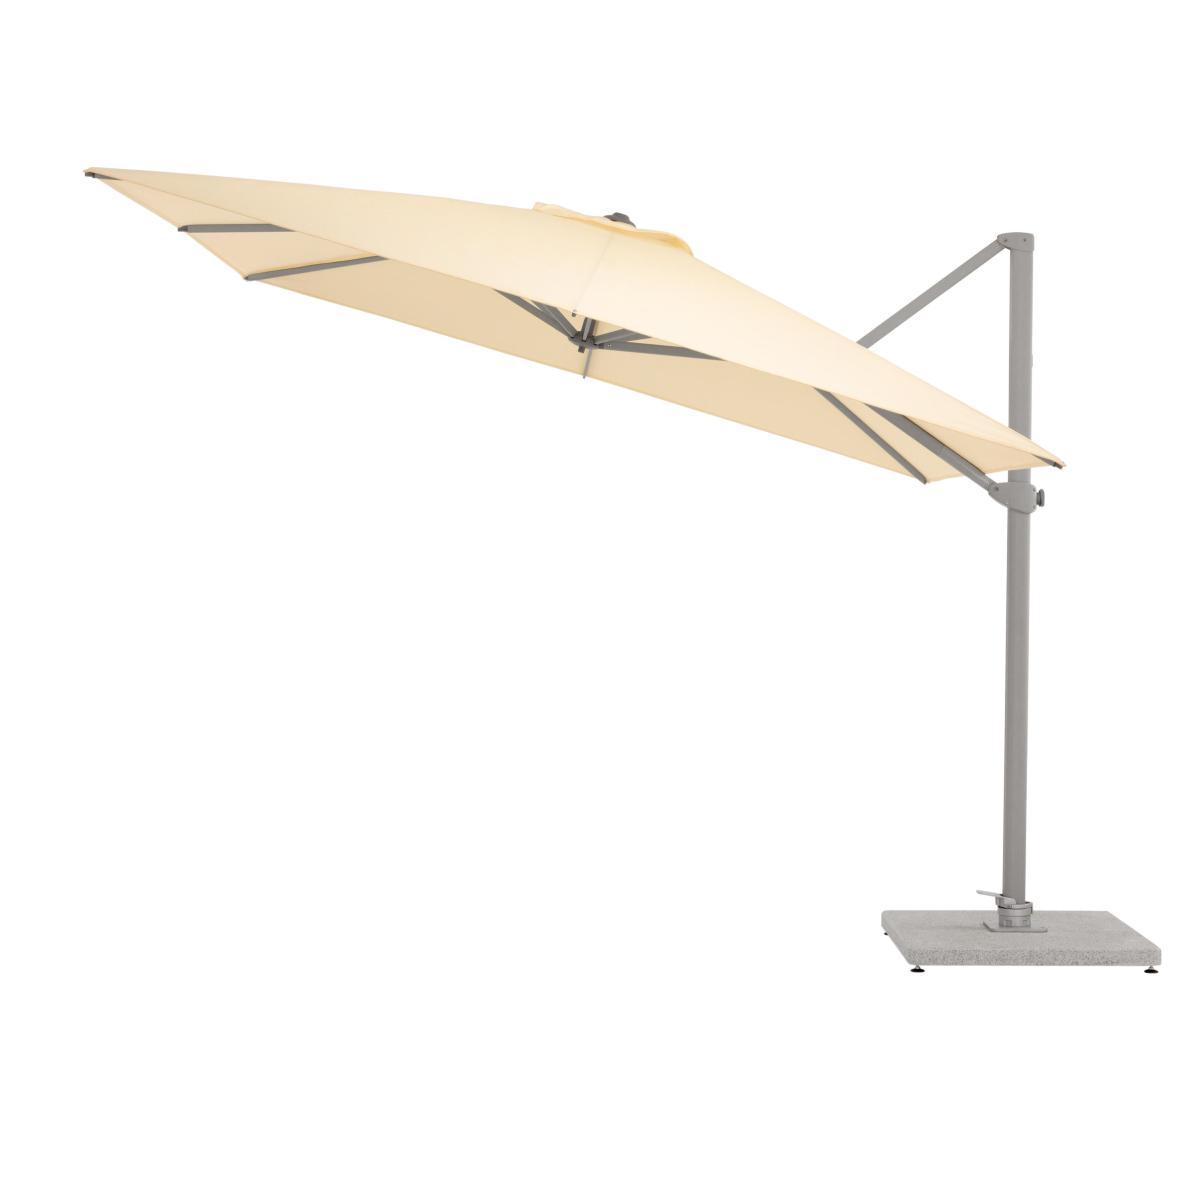 Freiarmschirm Sonnenschirm auch kippbar